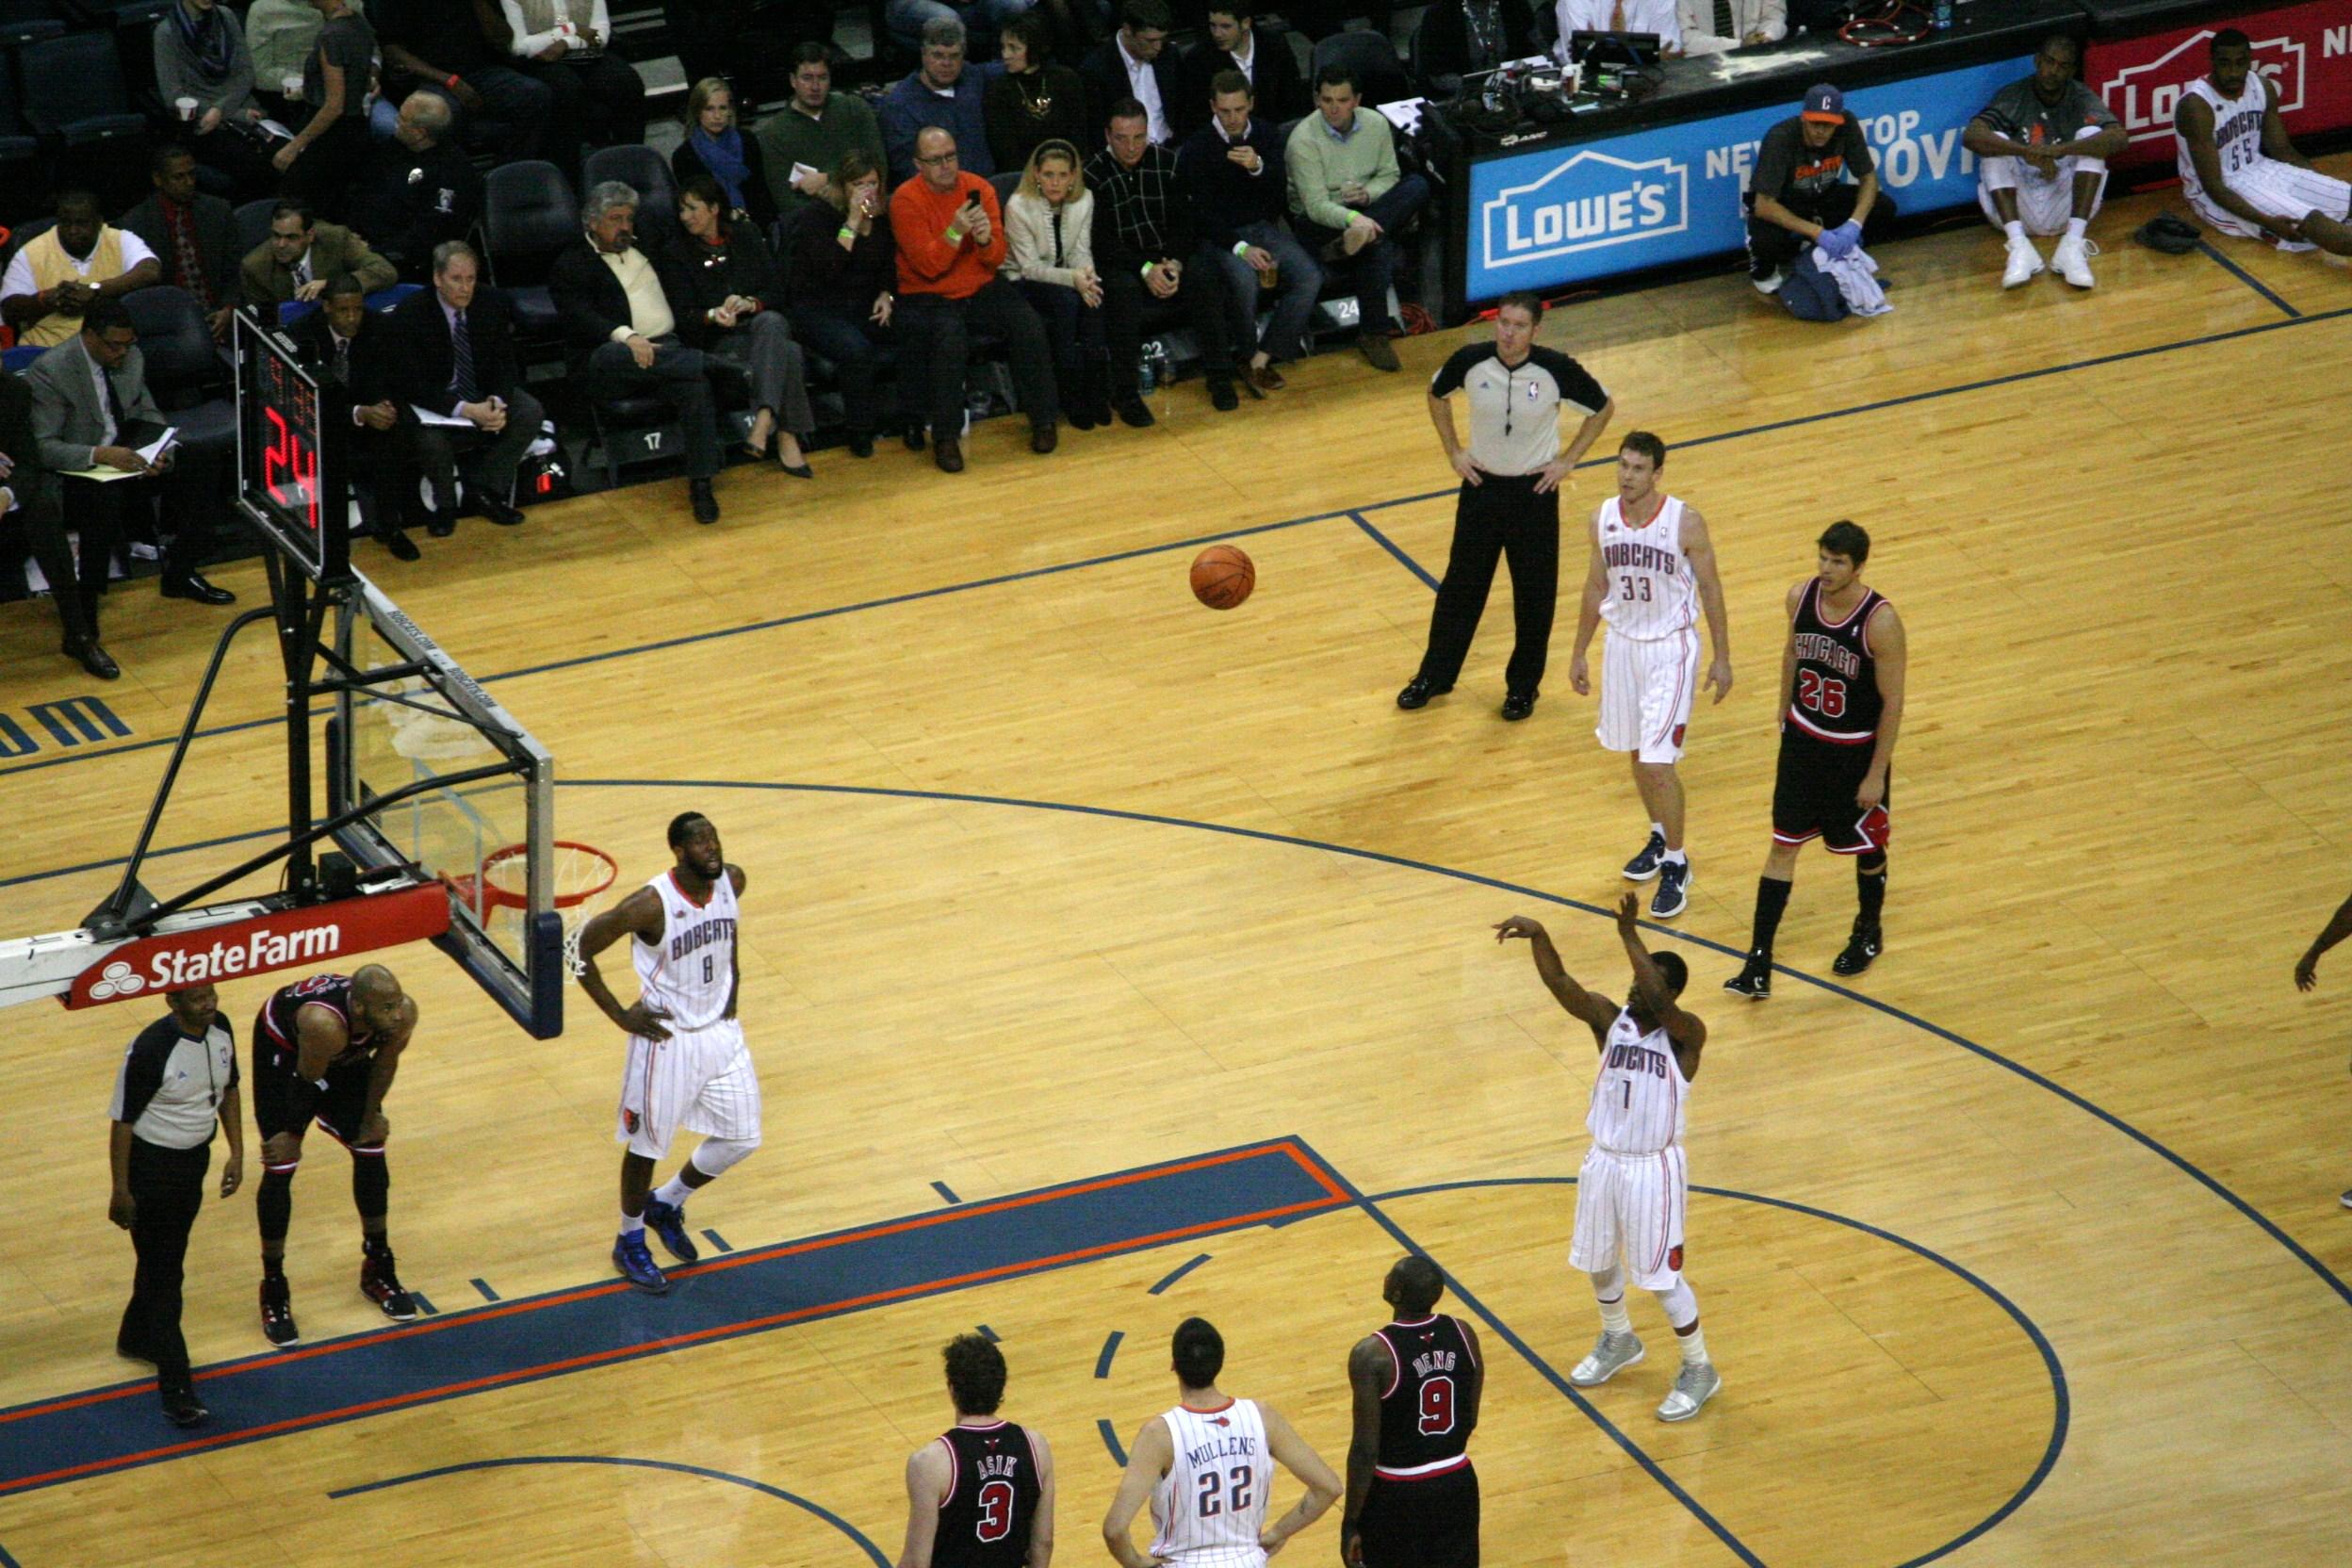 File:Kemba Walker free throw Bobcats.jpg - Wikimedia Commons